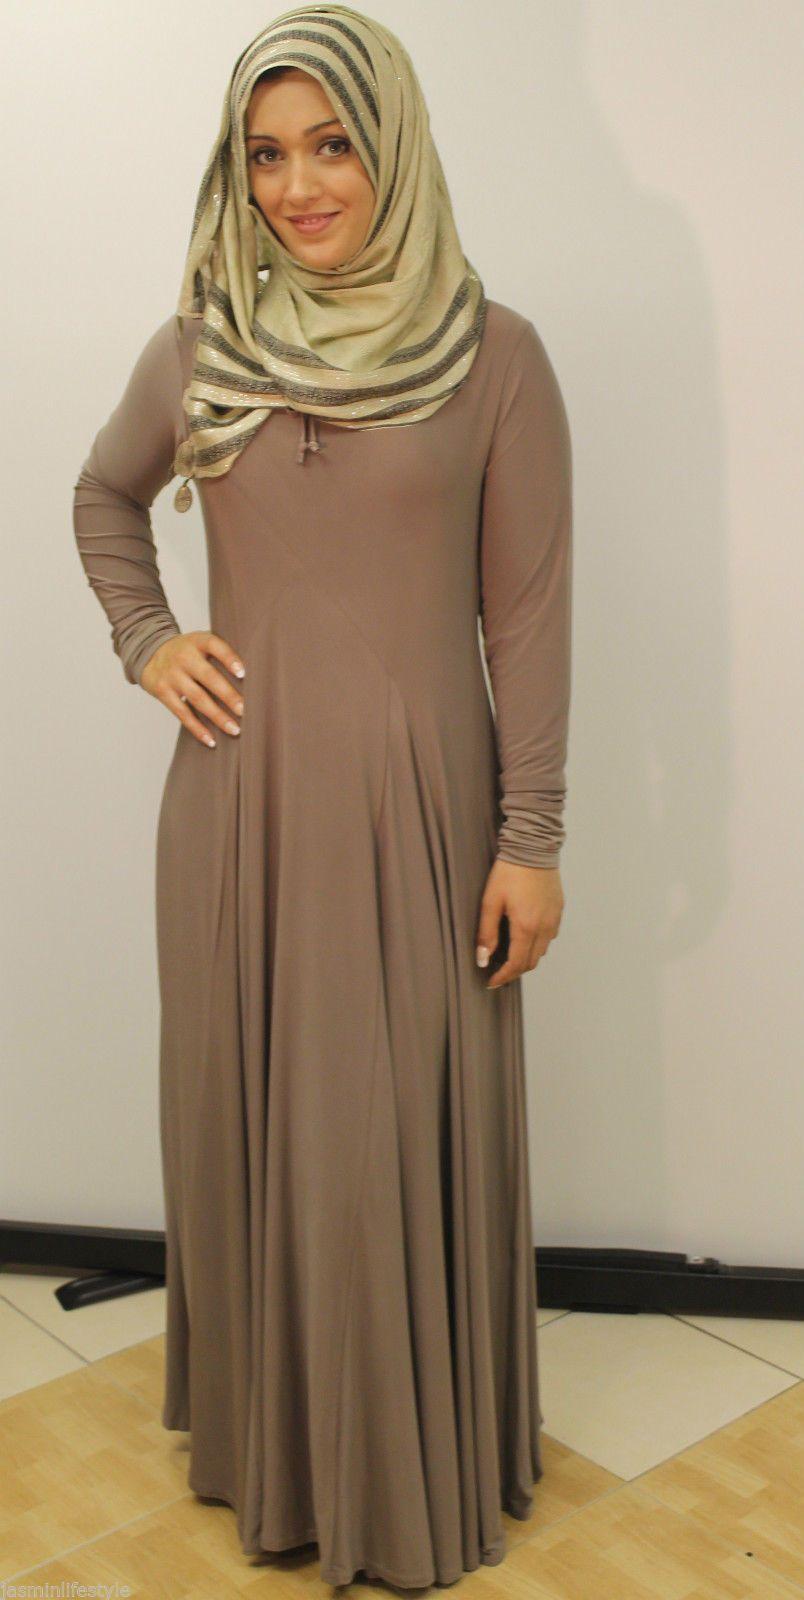 493694bd1c89a LadiesBeautiful New Fashion Flared Umbrella Cut Muslim Abaya Jilbab Hijab  Dress | eBay